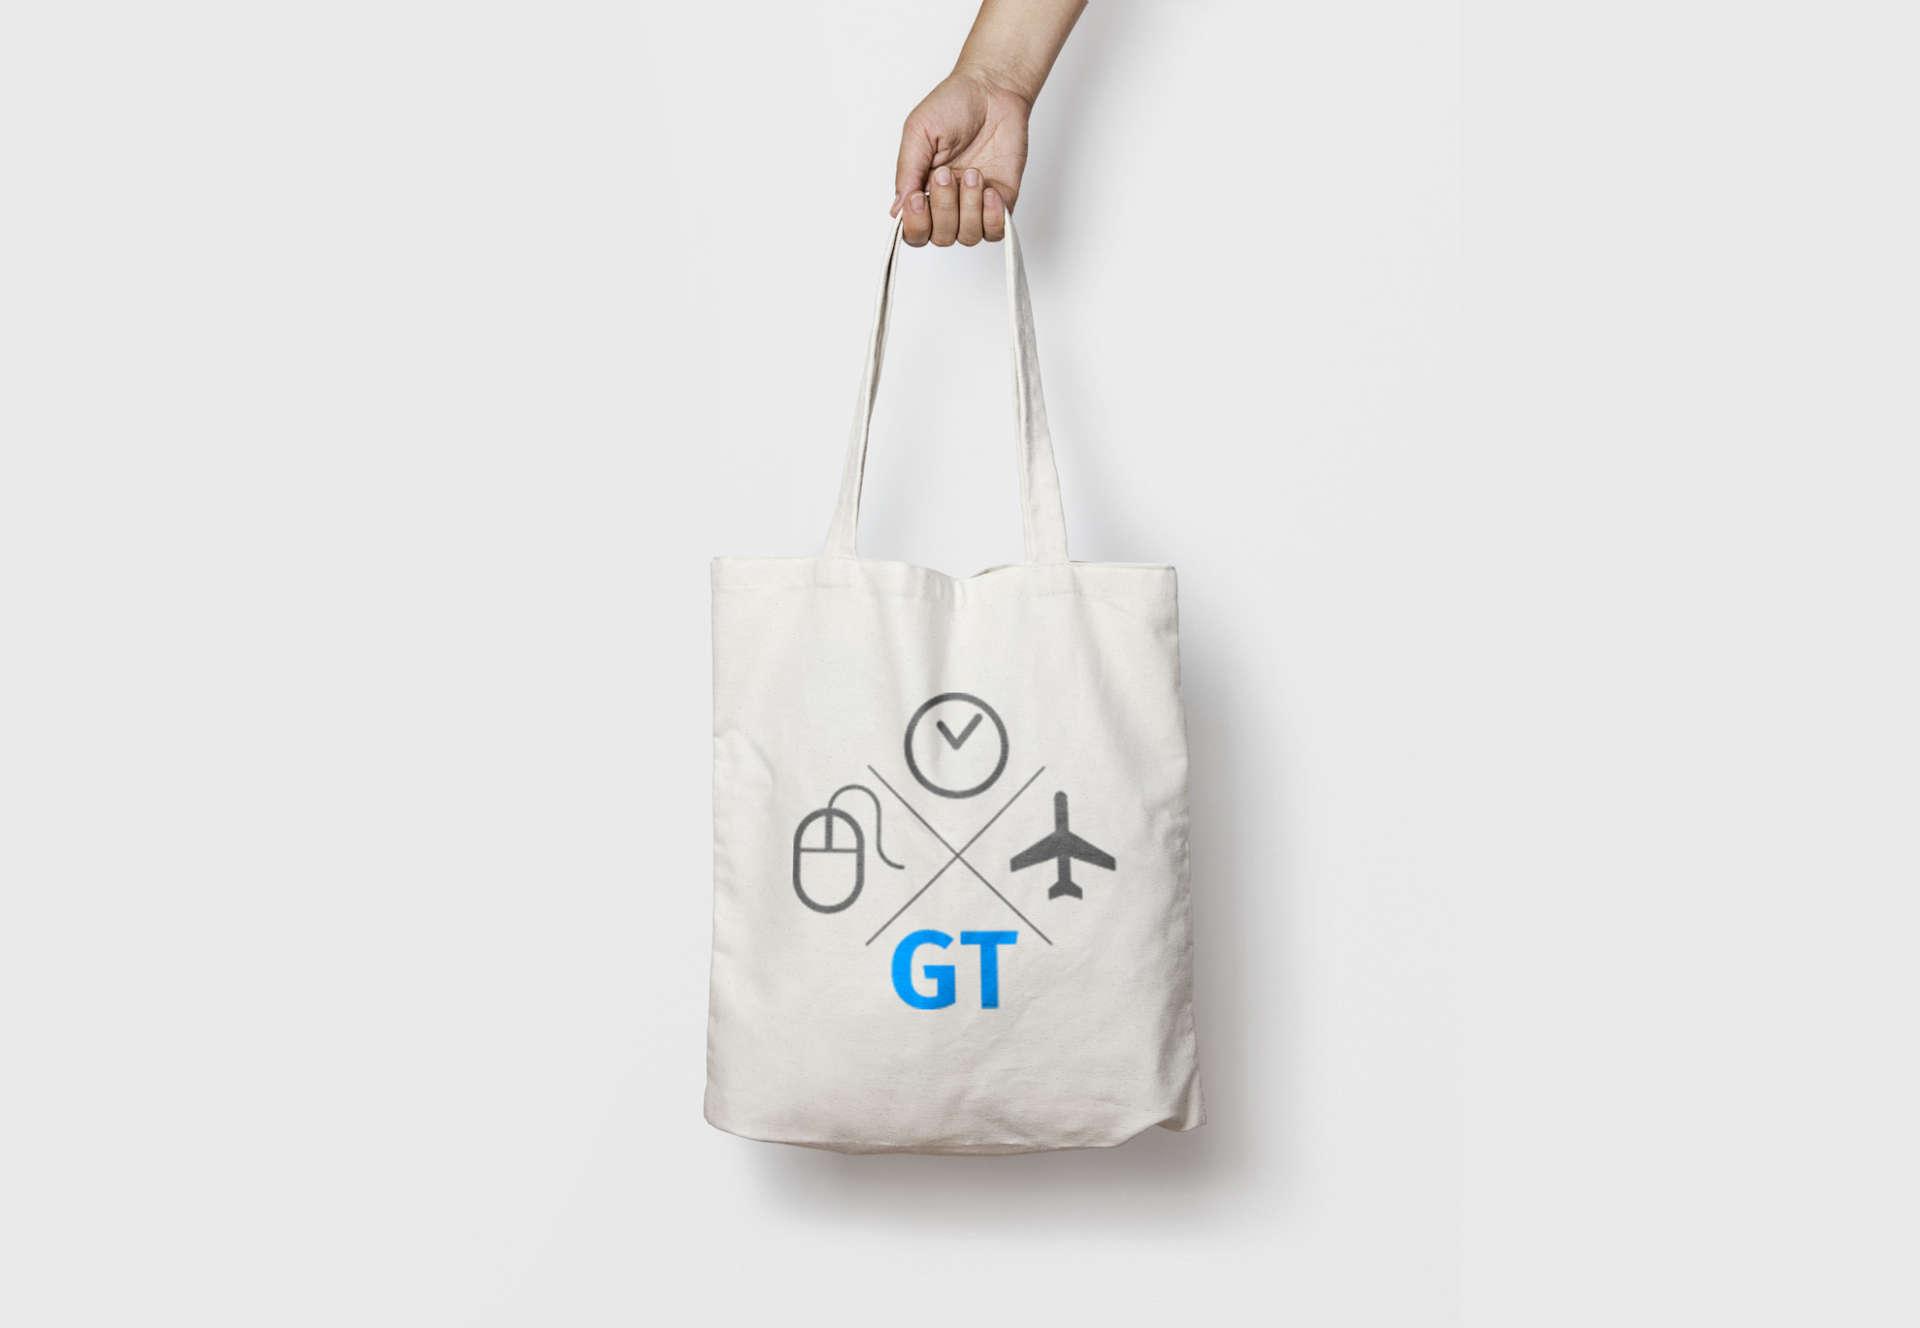 Get-Travel-totebag